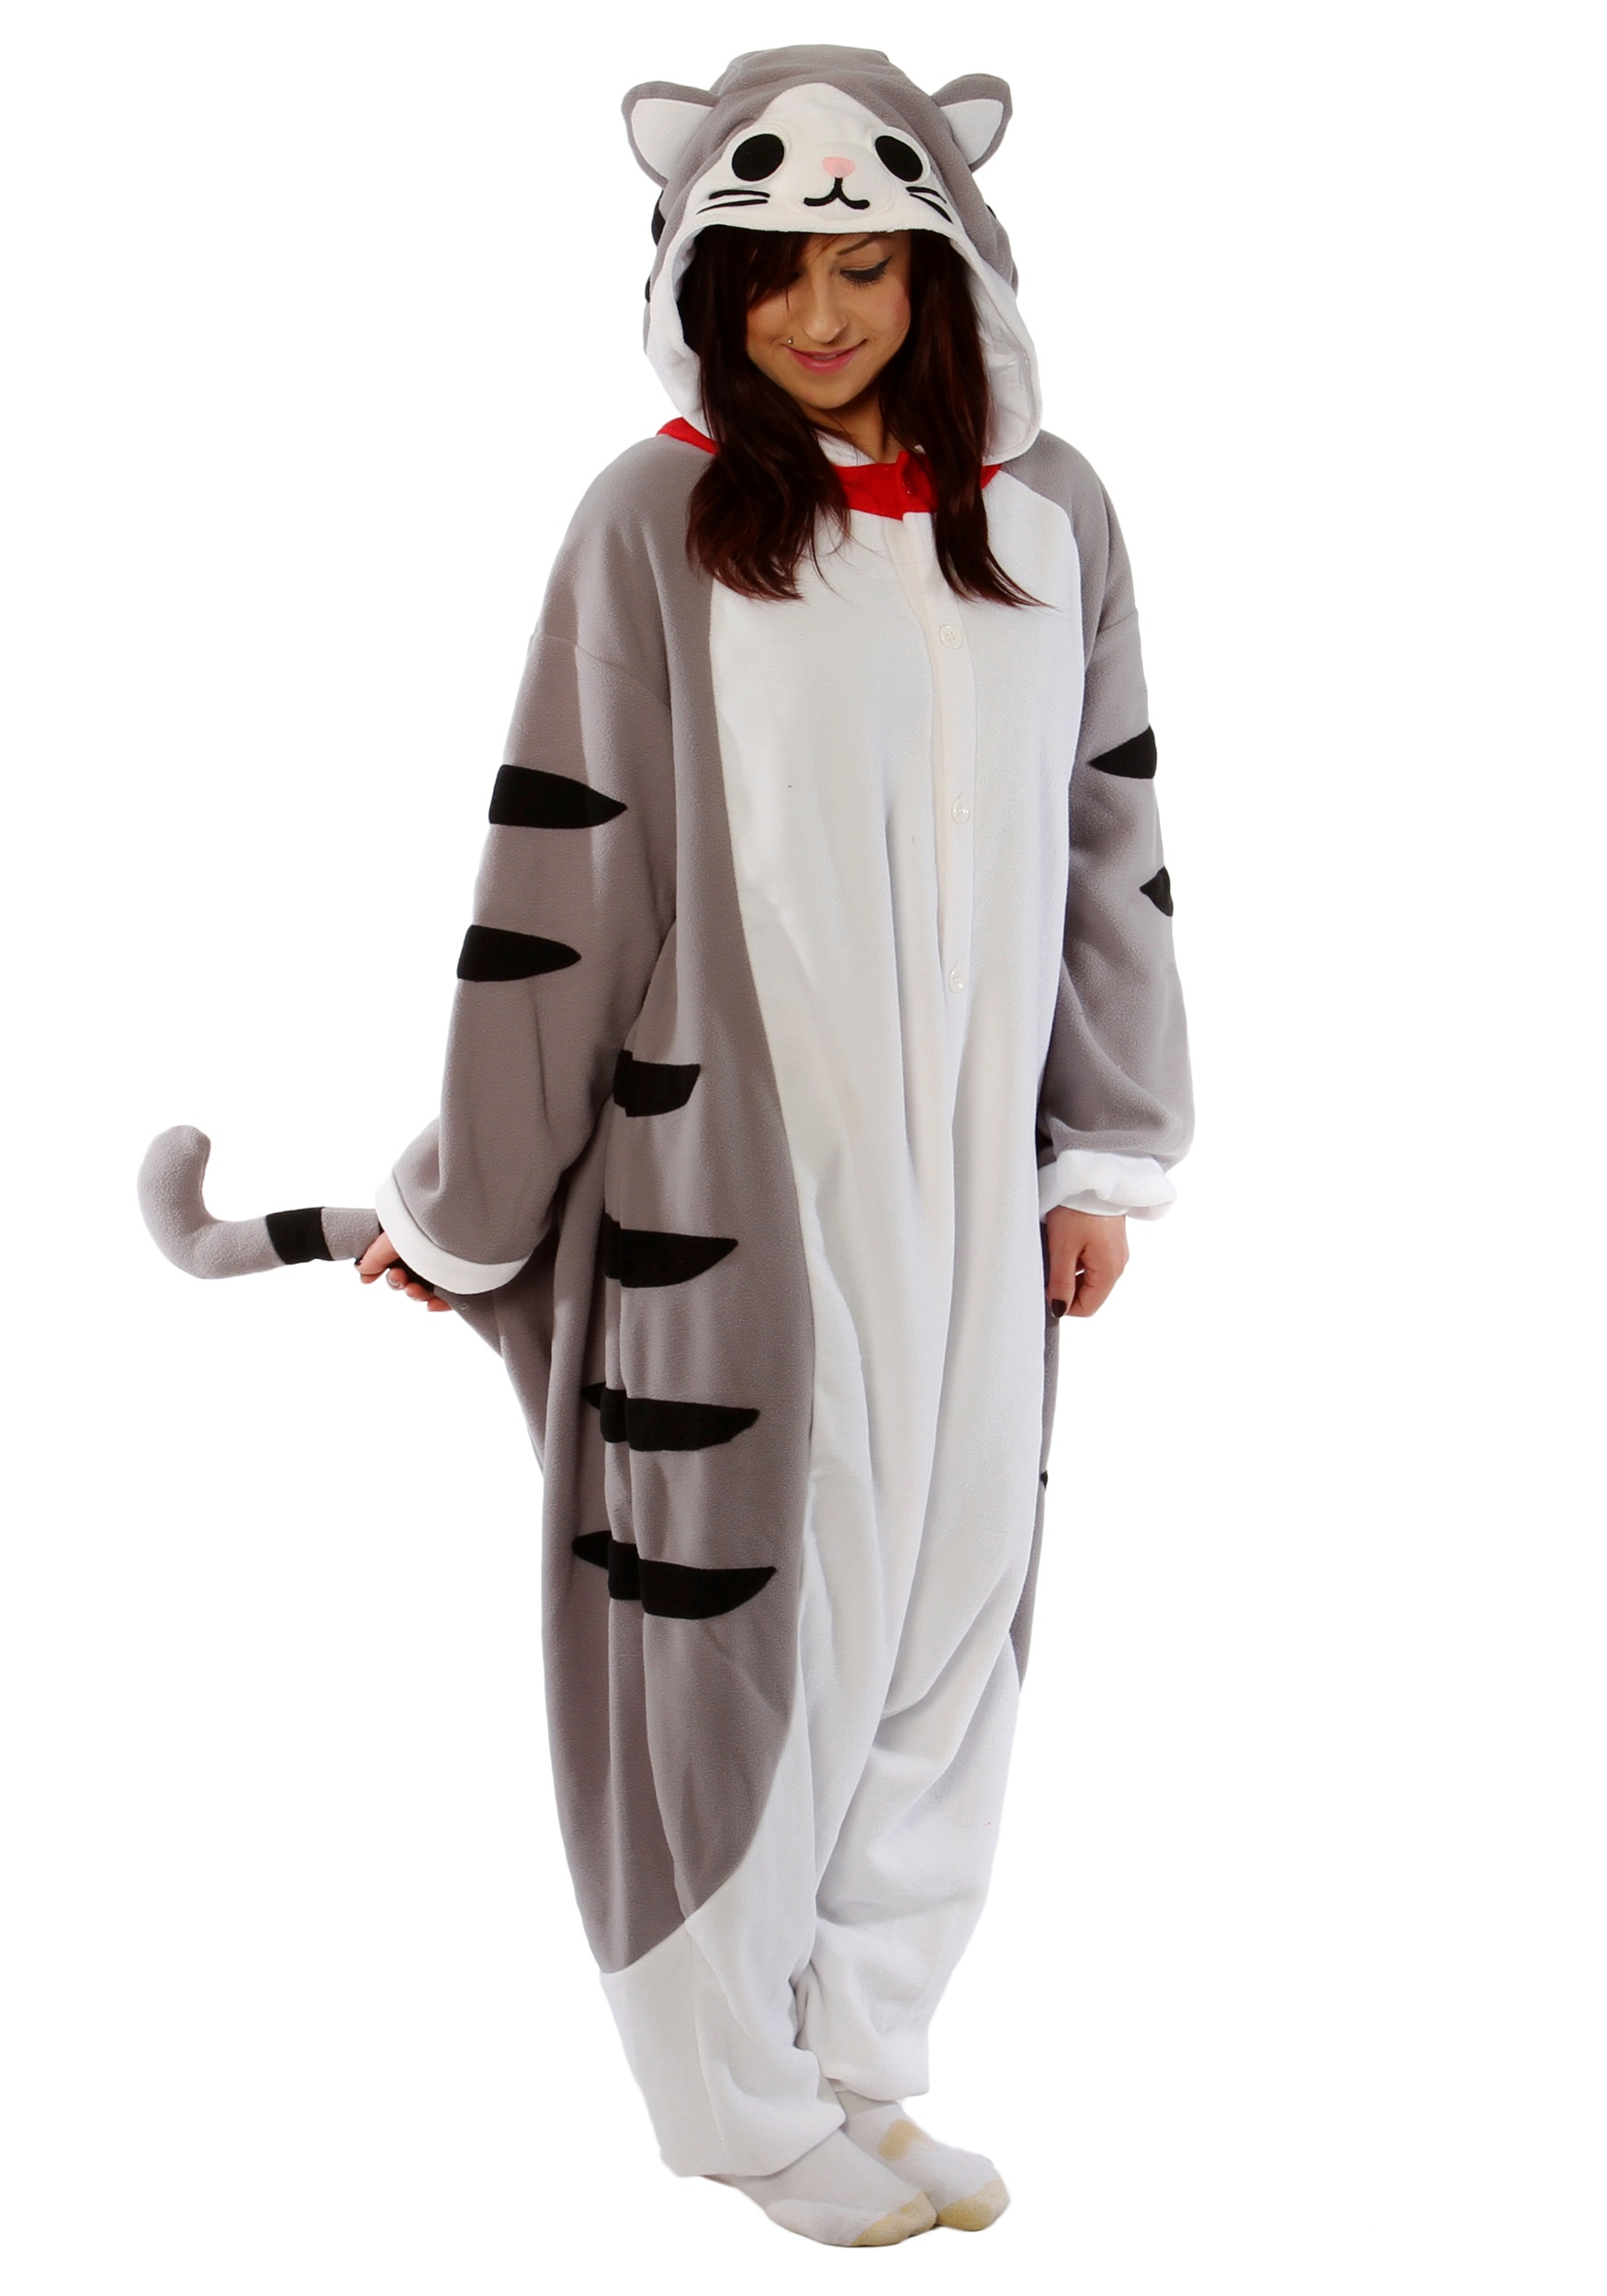 adult-tabby-cat-pajama-costume.jpg 803ddd48d4620